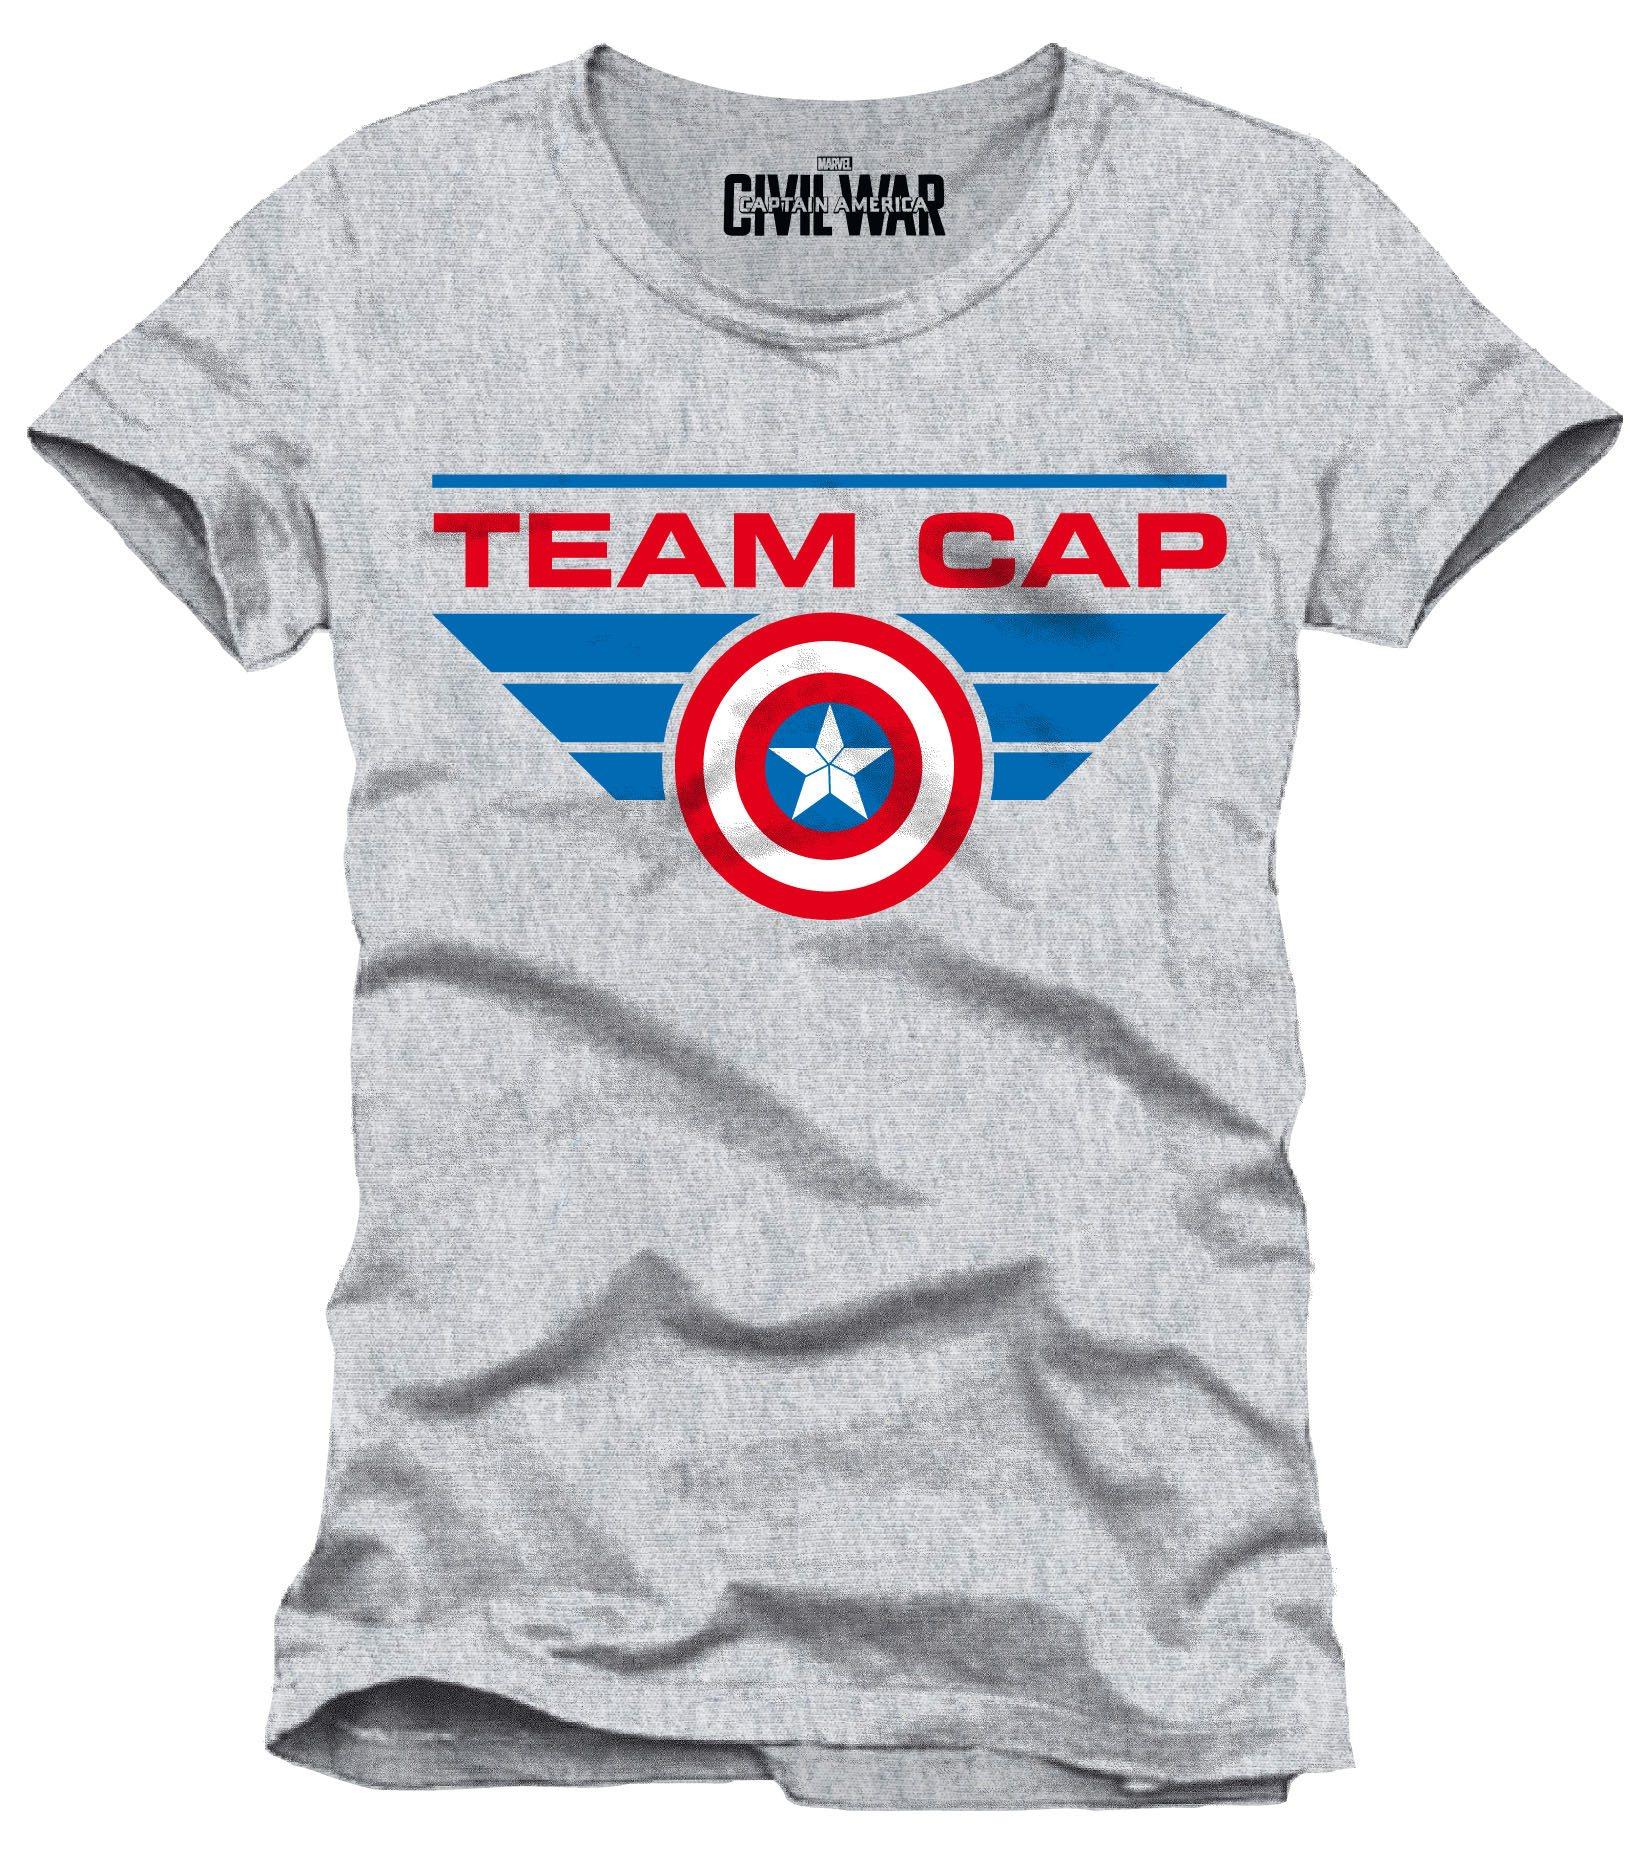 Captain America Civil War T-Shirt Team Cap Size L